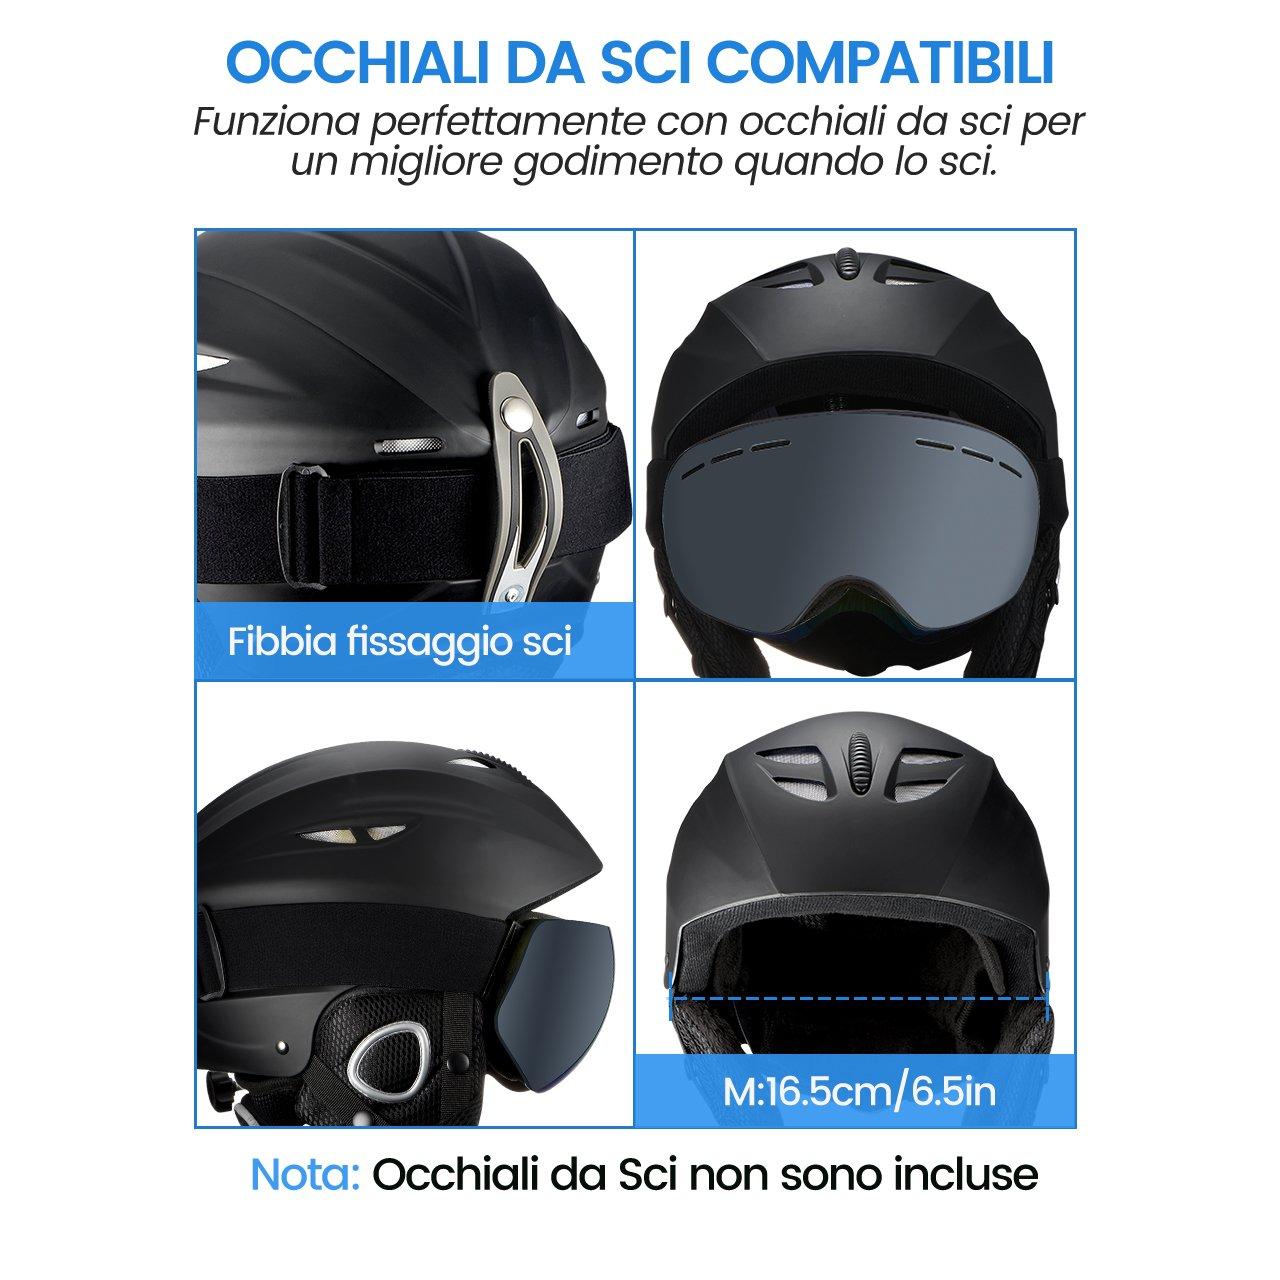 Velvet Earmuff and Lining Unisex OMORC Ski Helmet ABS /& EPS Material Snowboard Helmet Controllable Ventilation